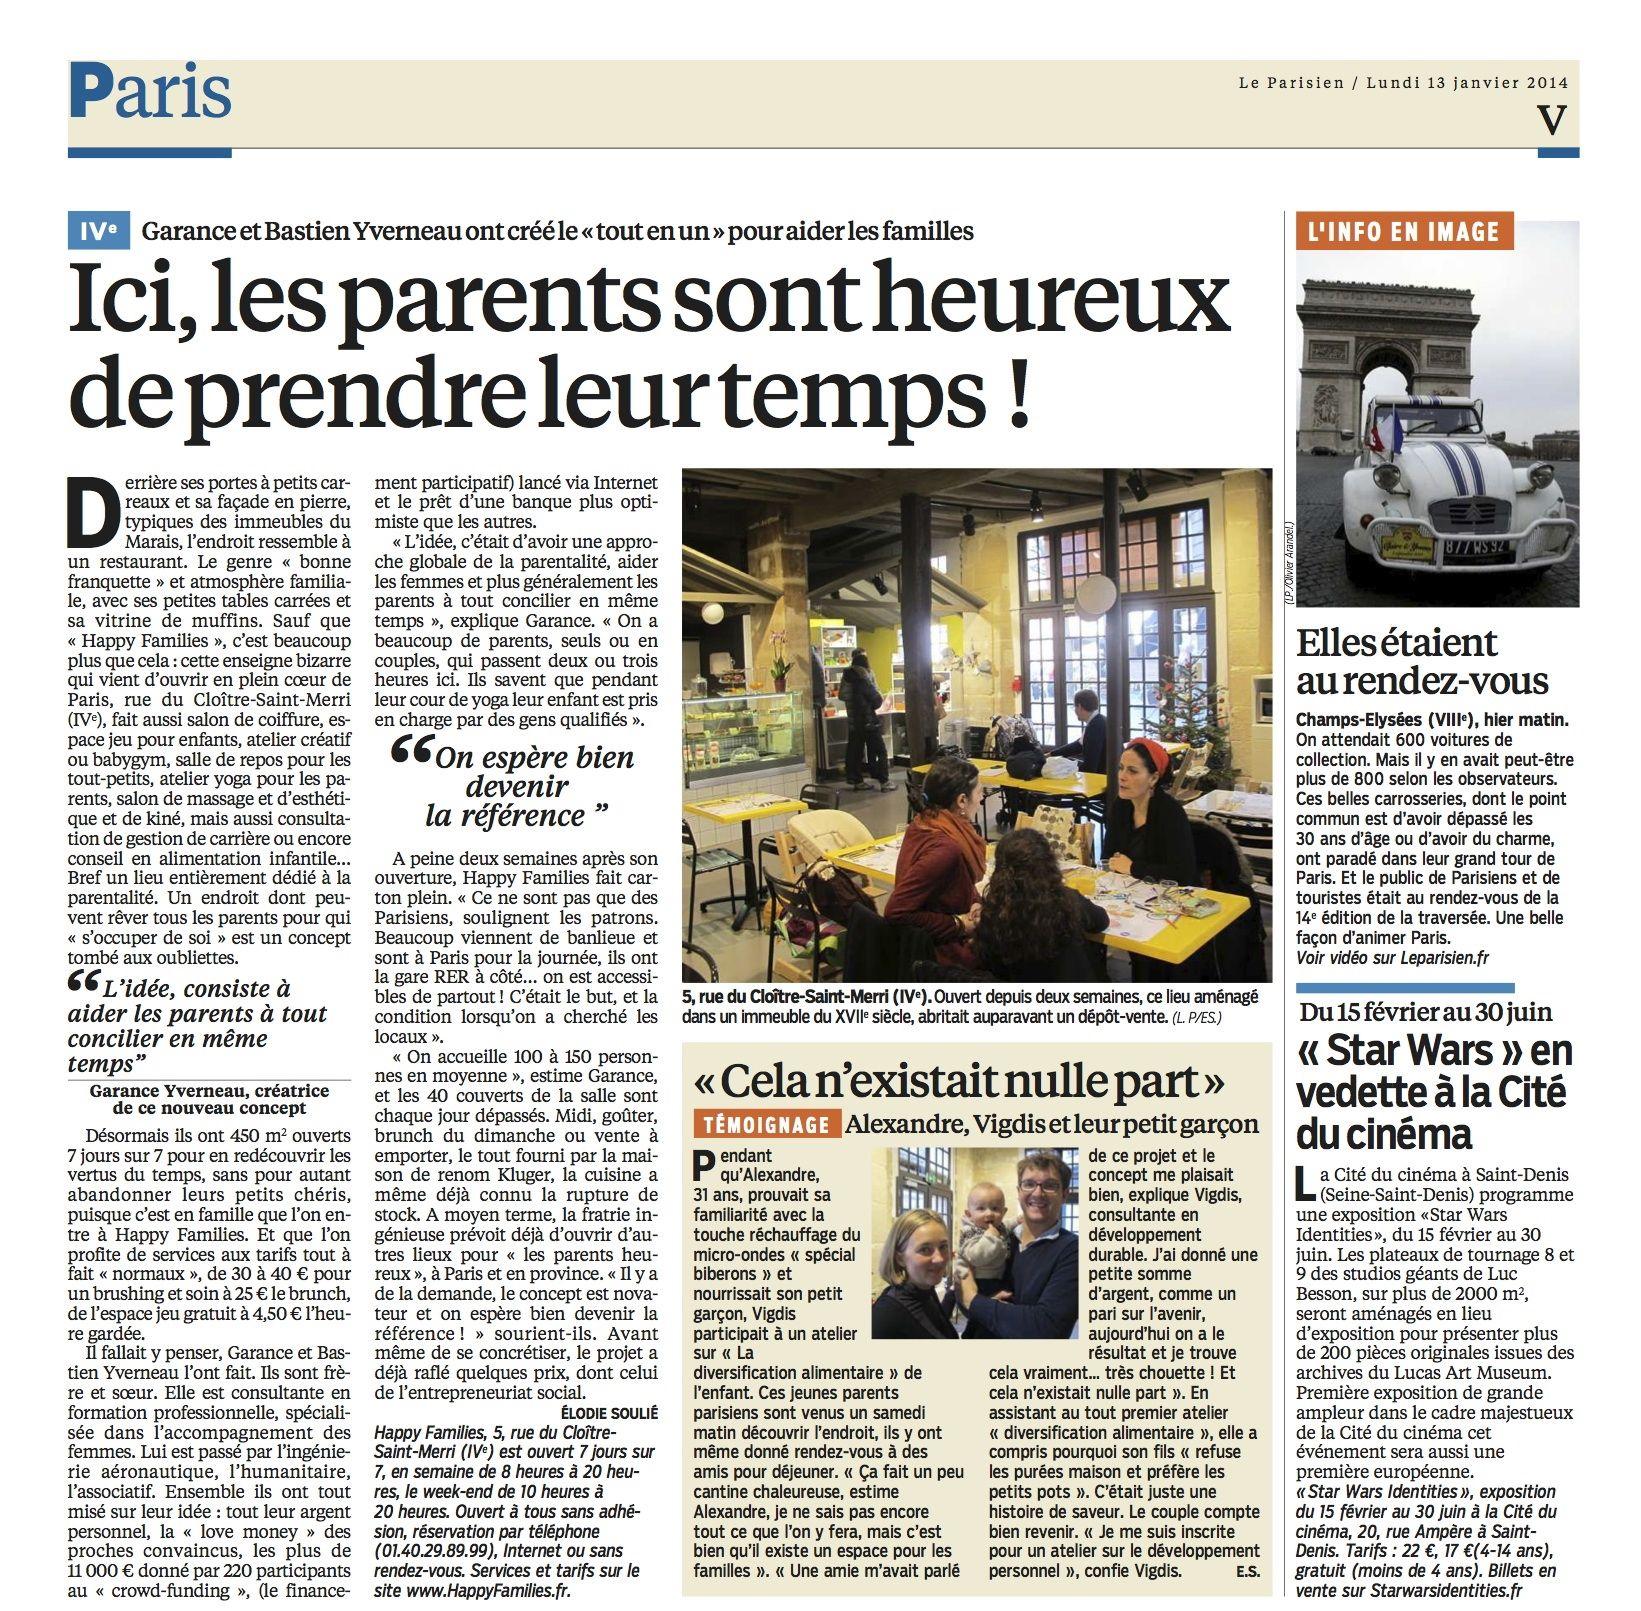 Article Parisien  - copie